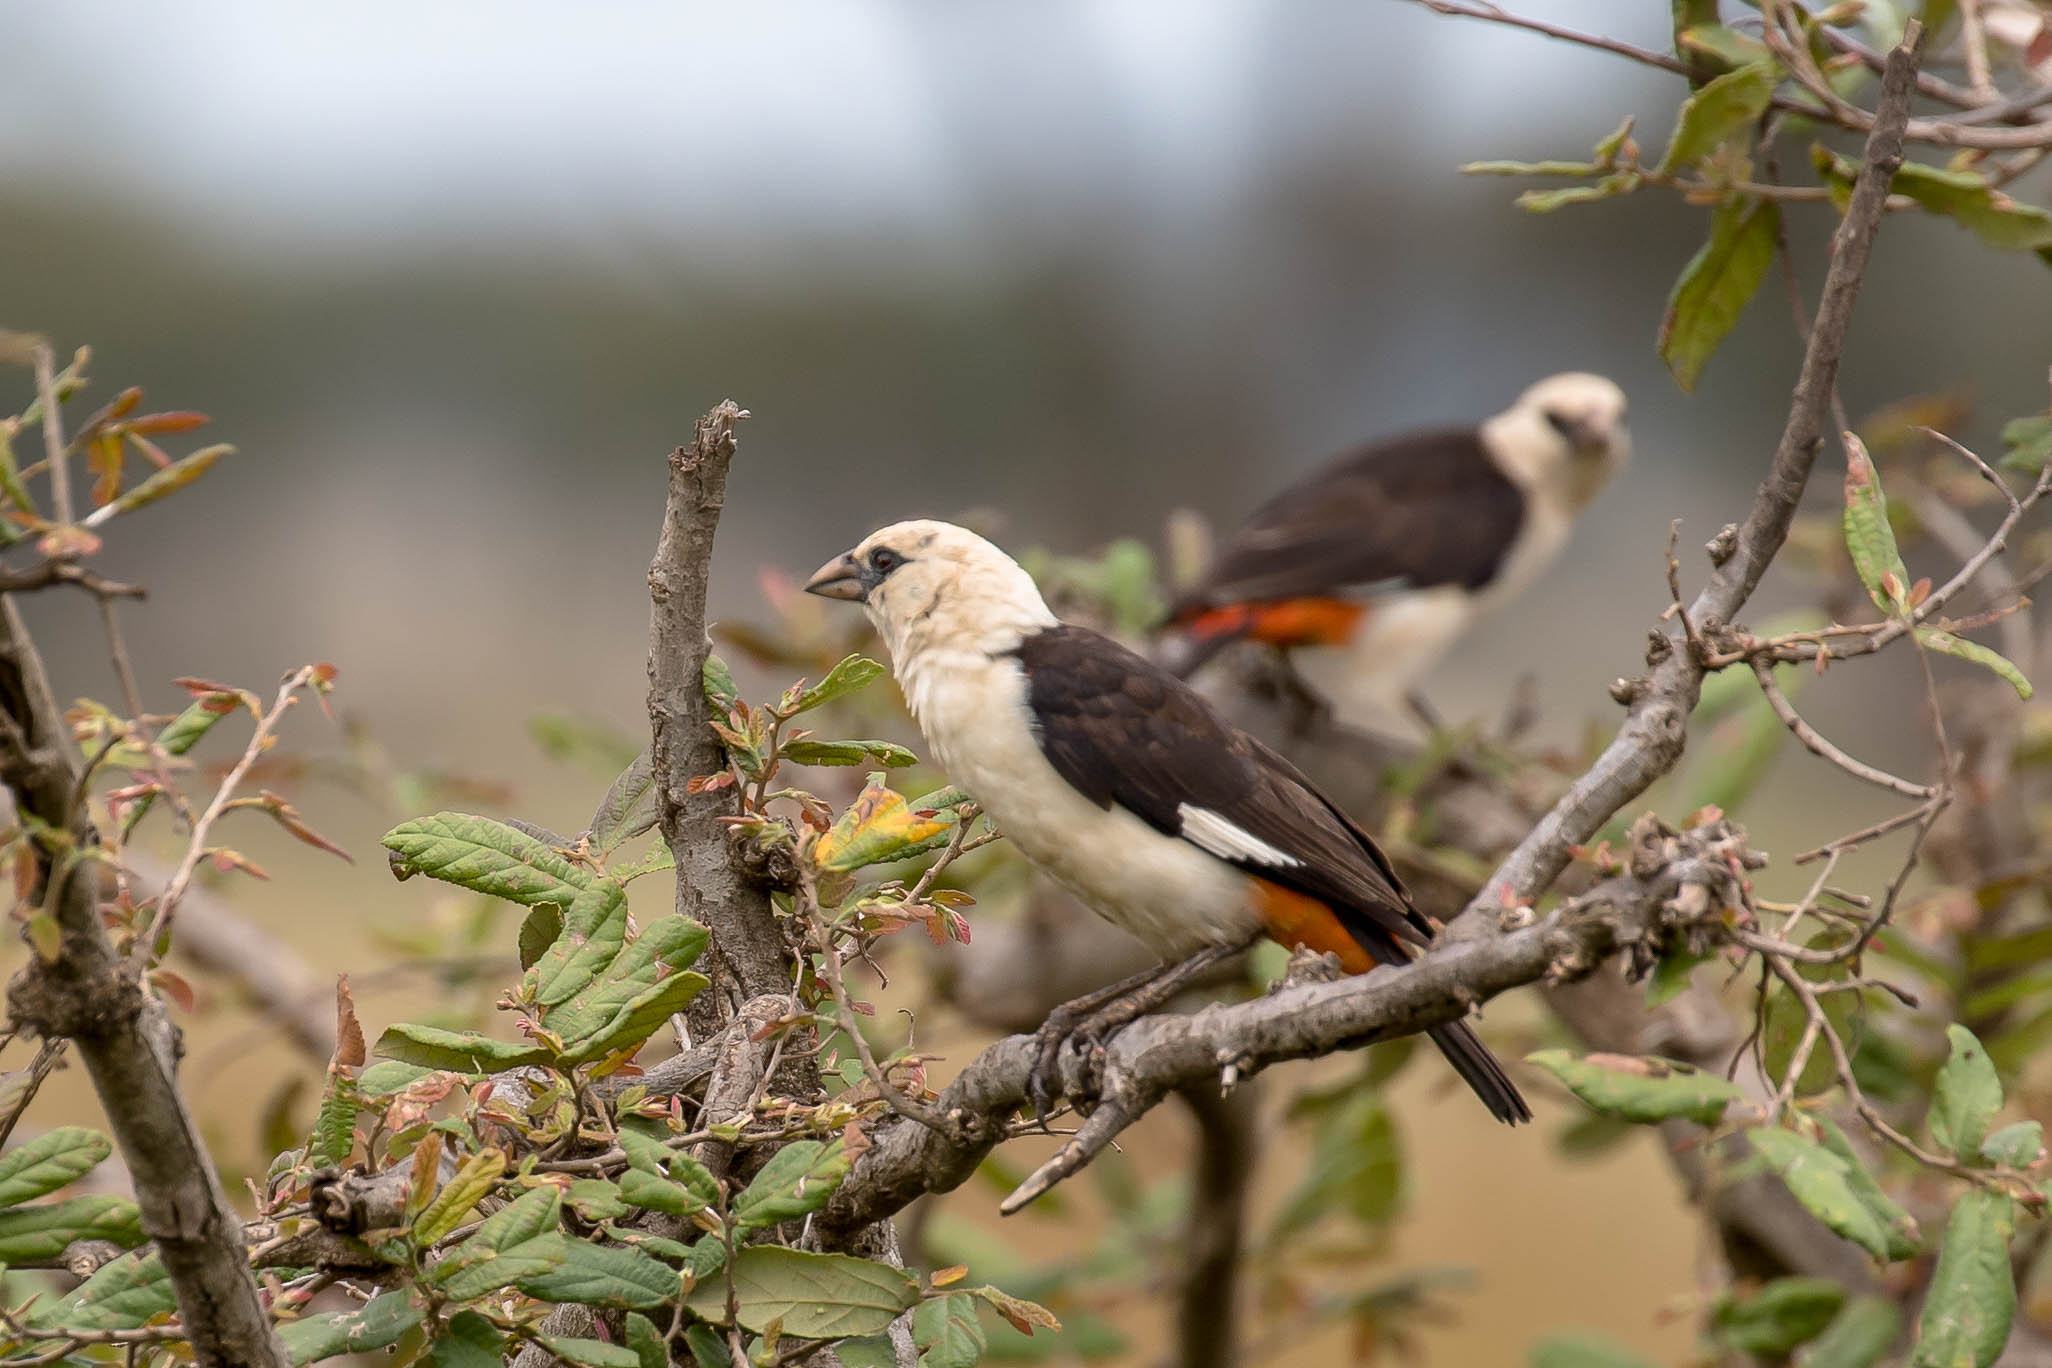 Starwebervögel